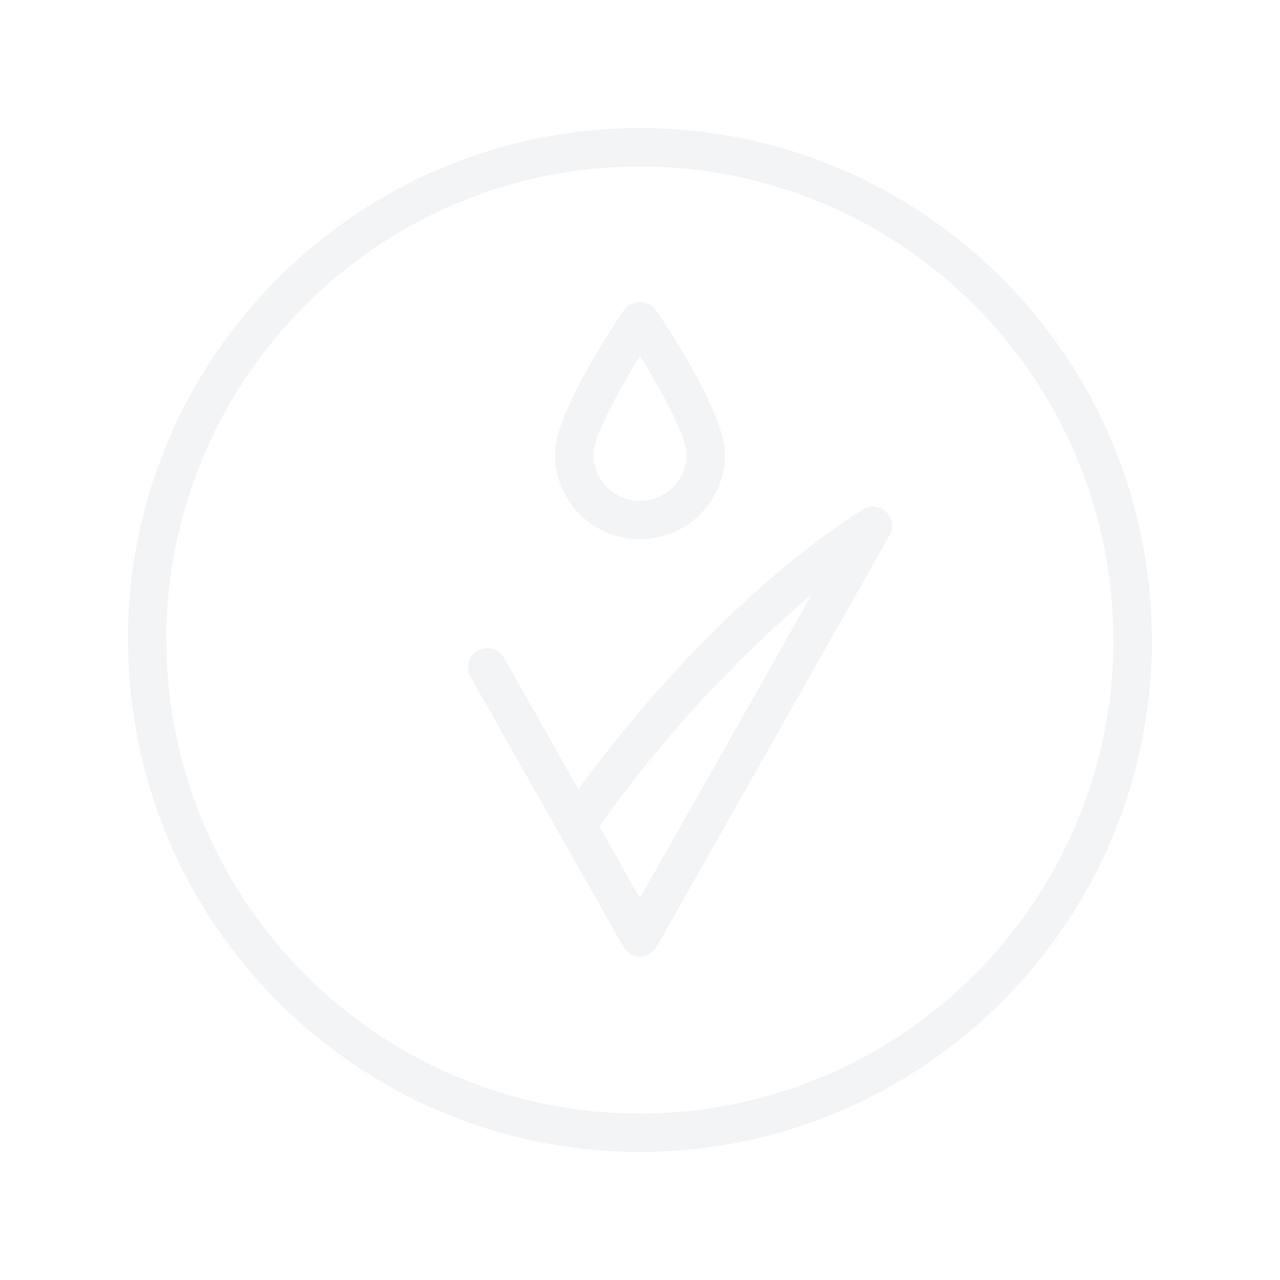 JUVENA Skin Energy Refine & Exfoliate Mask 50ml